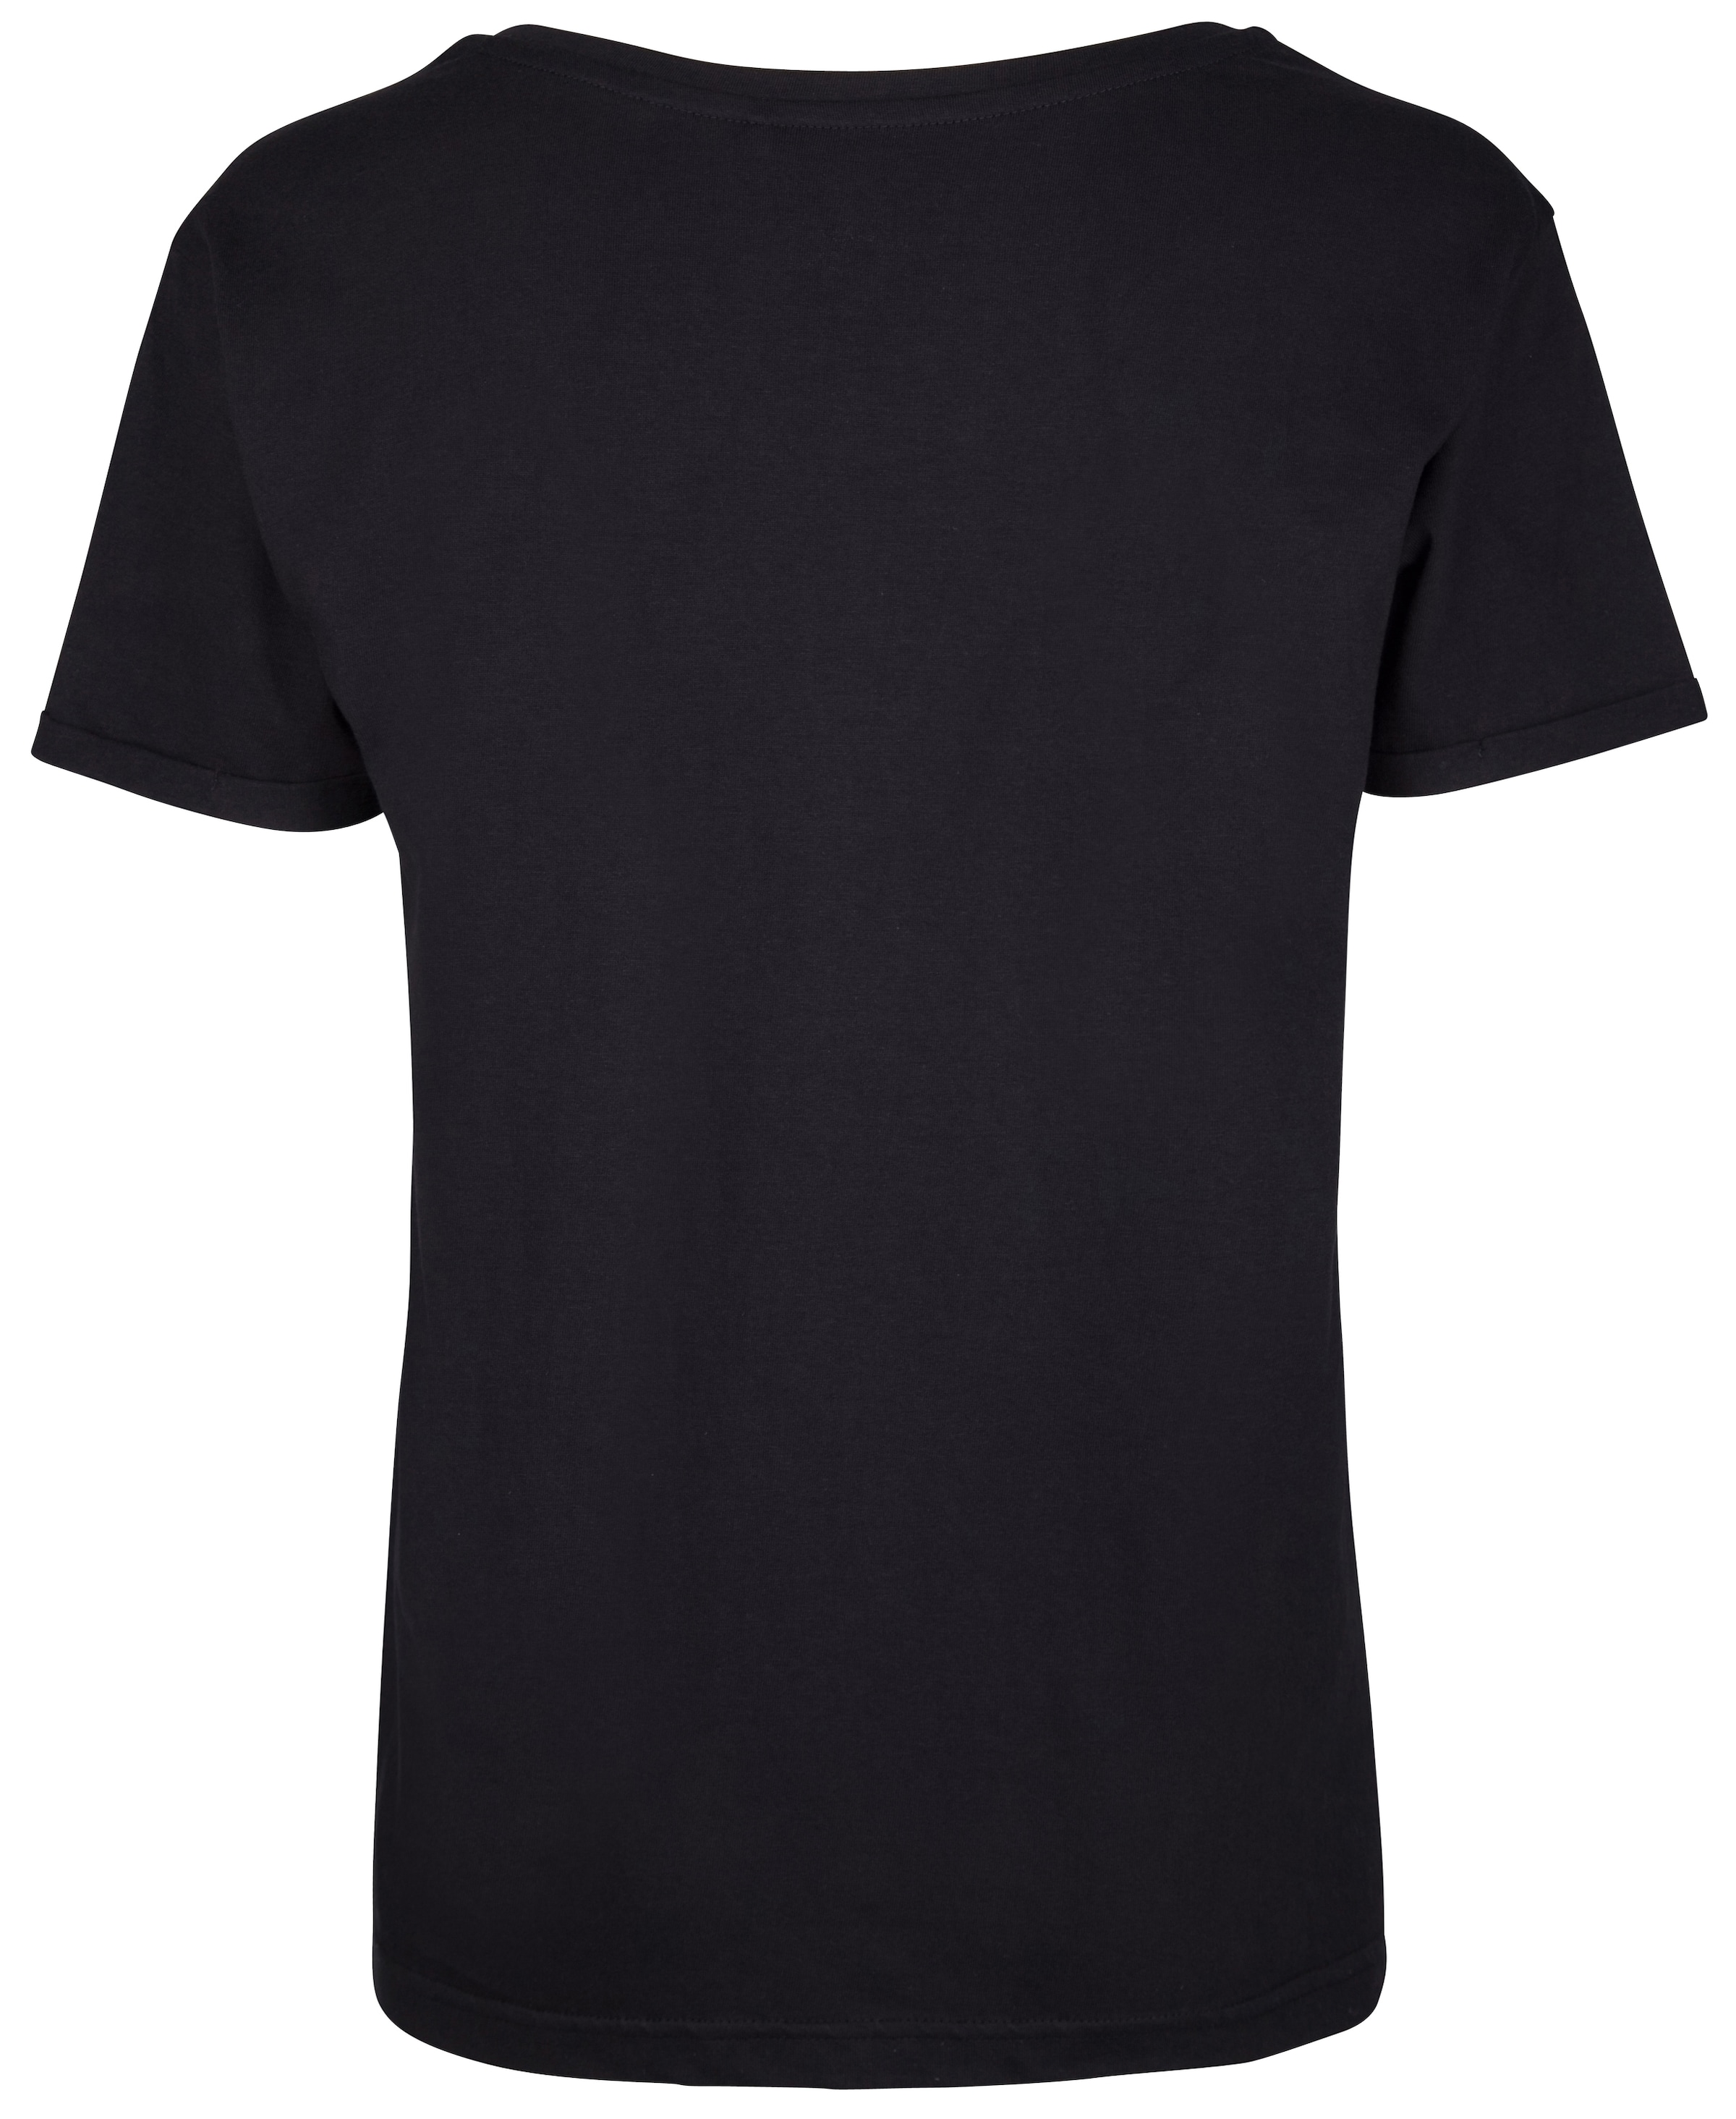 Noir T shirt T shirt Mymo T Mymo En En Mymo Noir oxedBrC